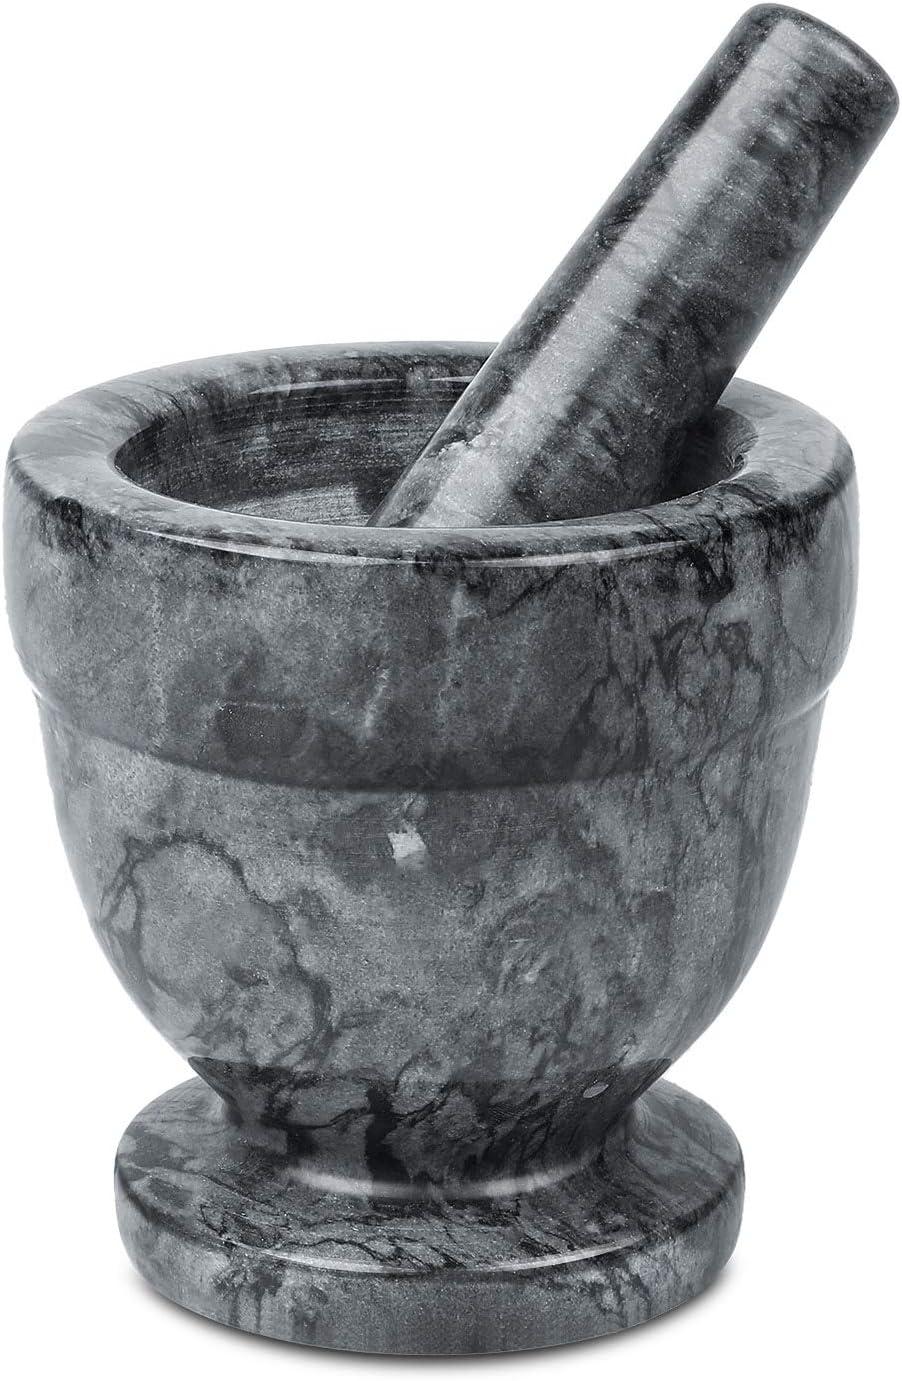 Flexzion Granite Mortar and Pestle Set - 4 Inch, Solid Granite Stone Grinder Bowl Holder for Guacamole, Herbs, Spices, Garlic, Kitchen, Cooking, Medicine, Pills, Grain, Seeds, Fruits, Kitchen